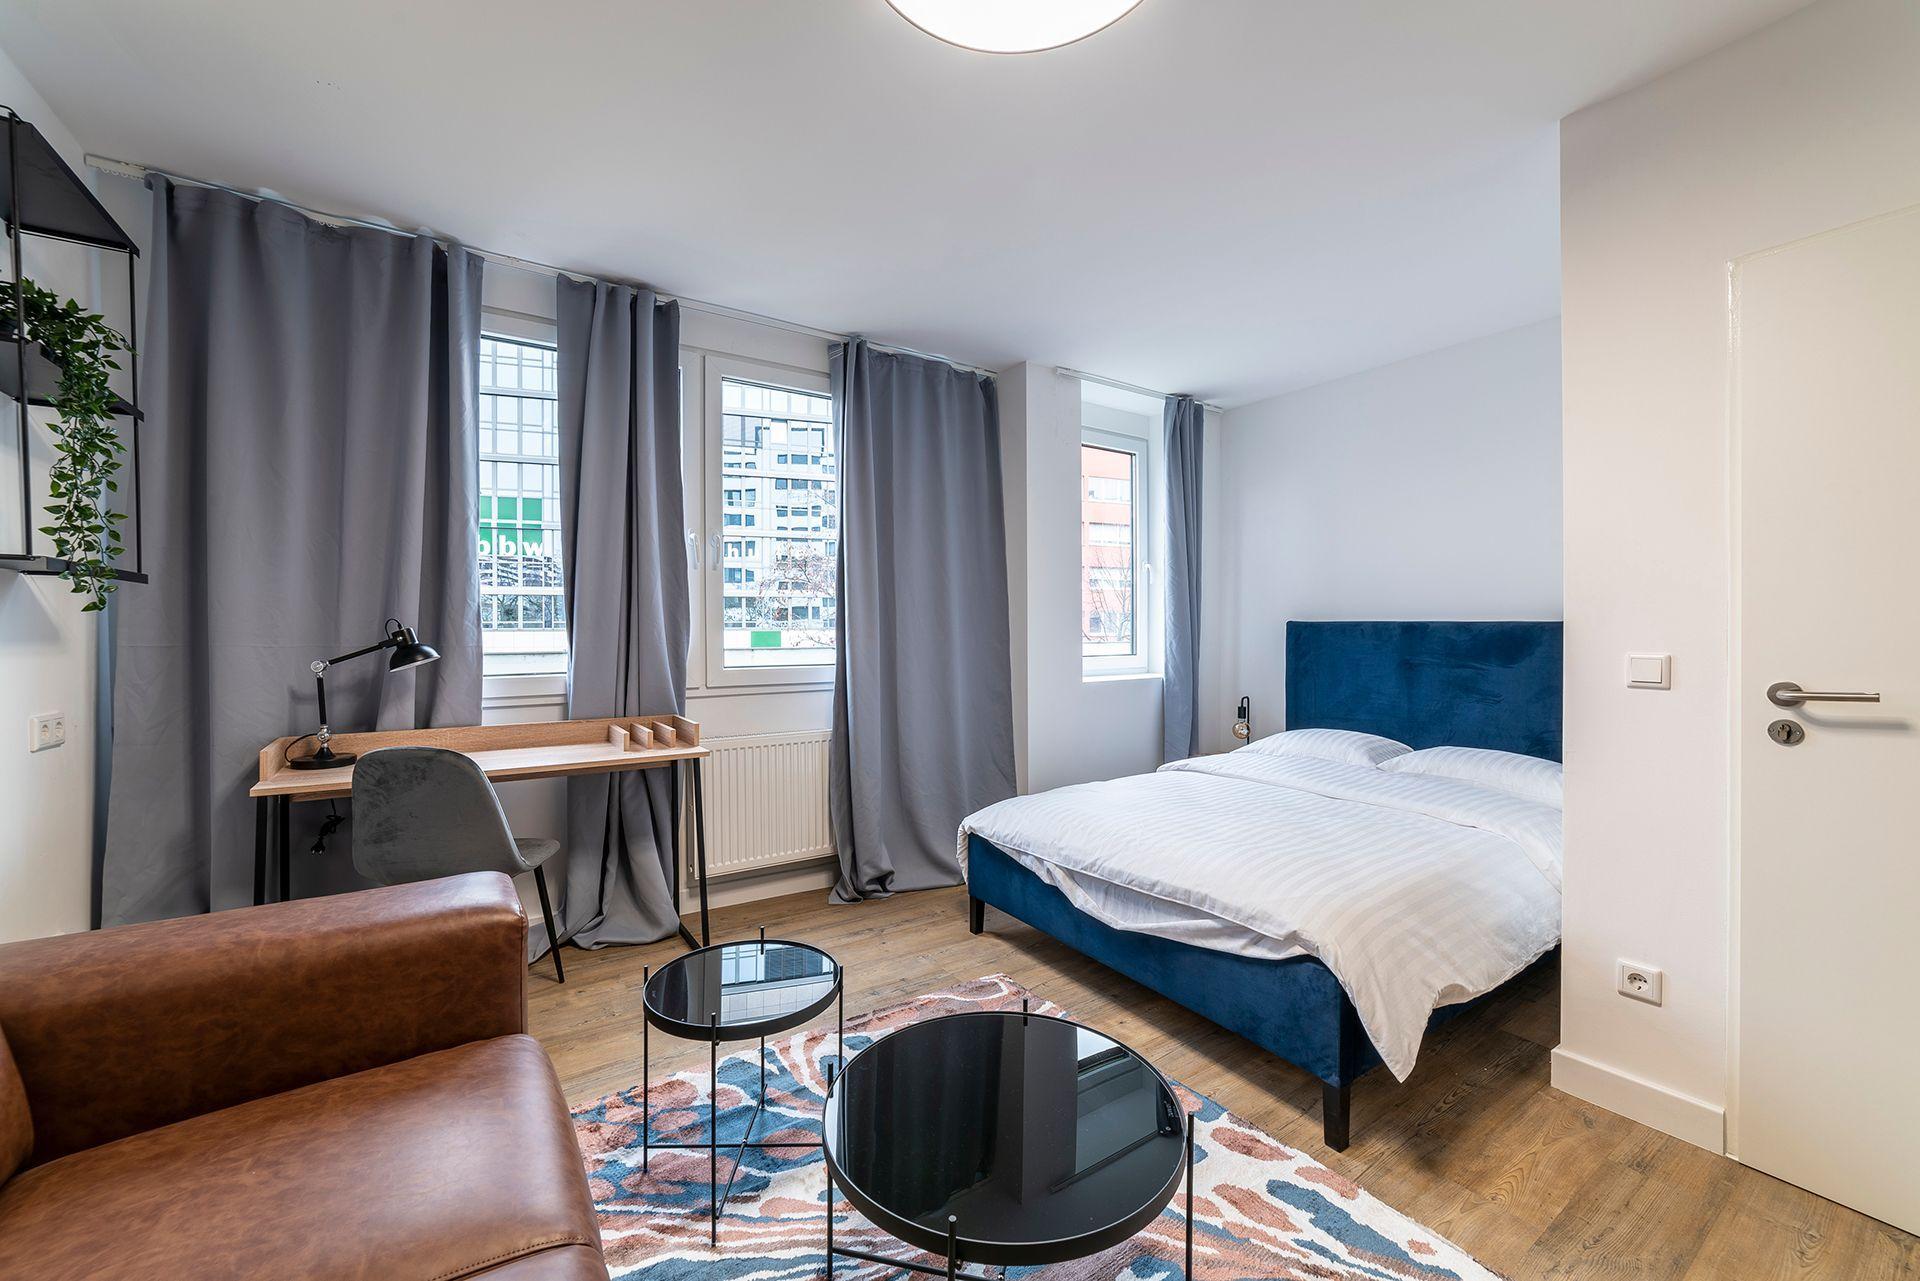 Private Room - Medium apartment to rent in Berlin BILE-B103-5023-1